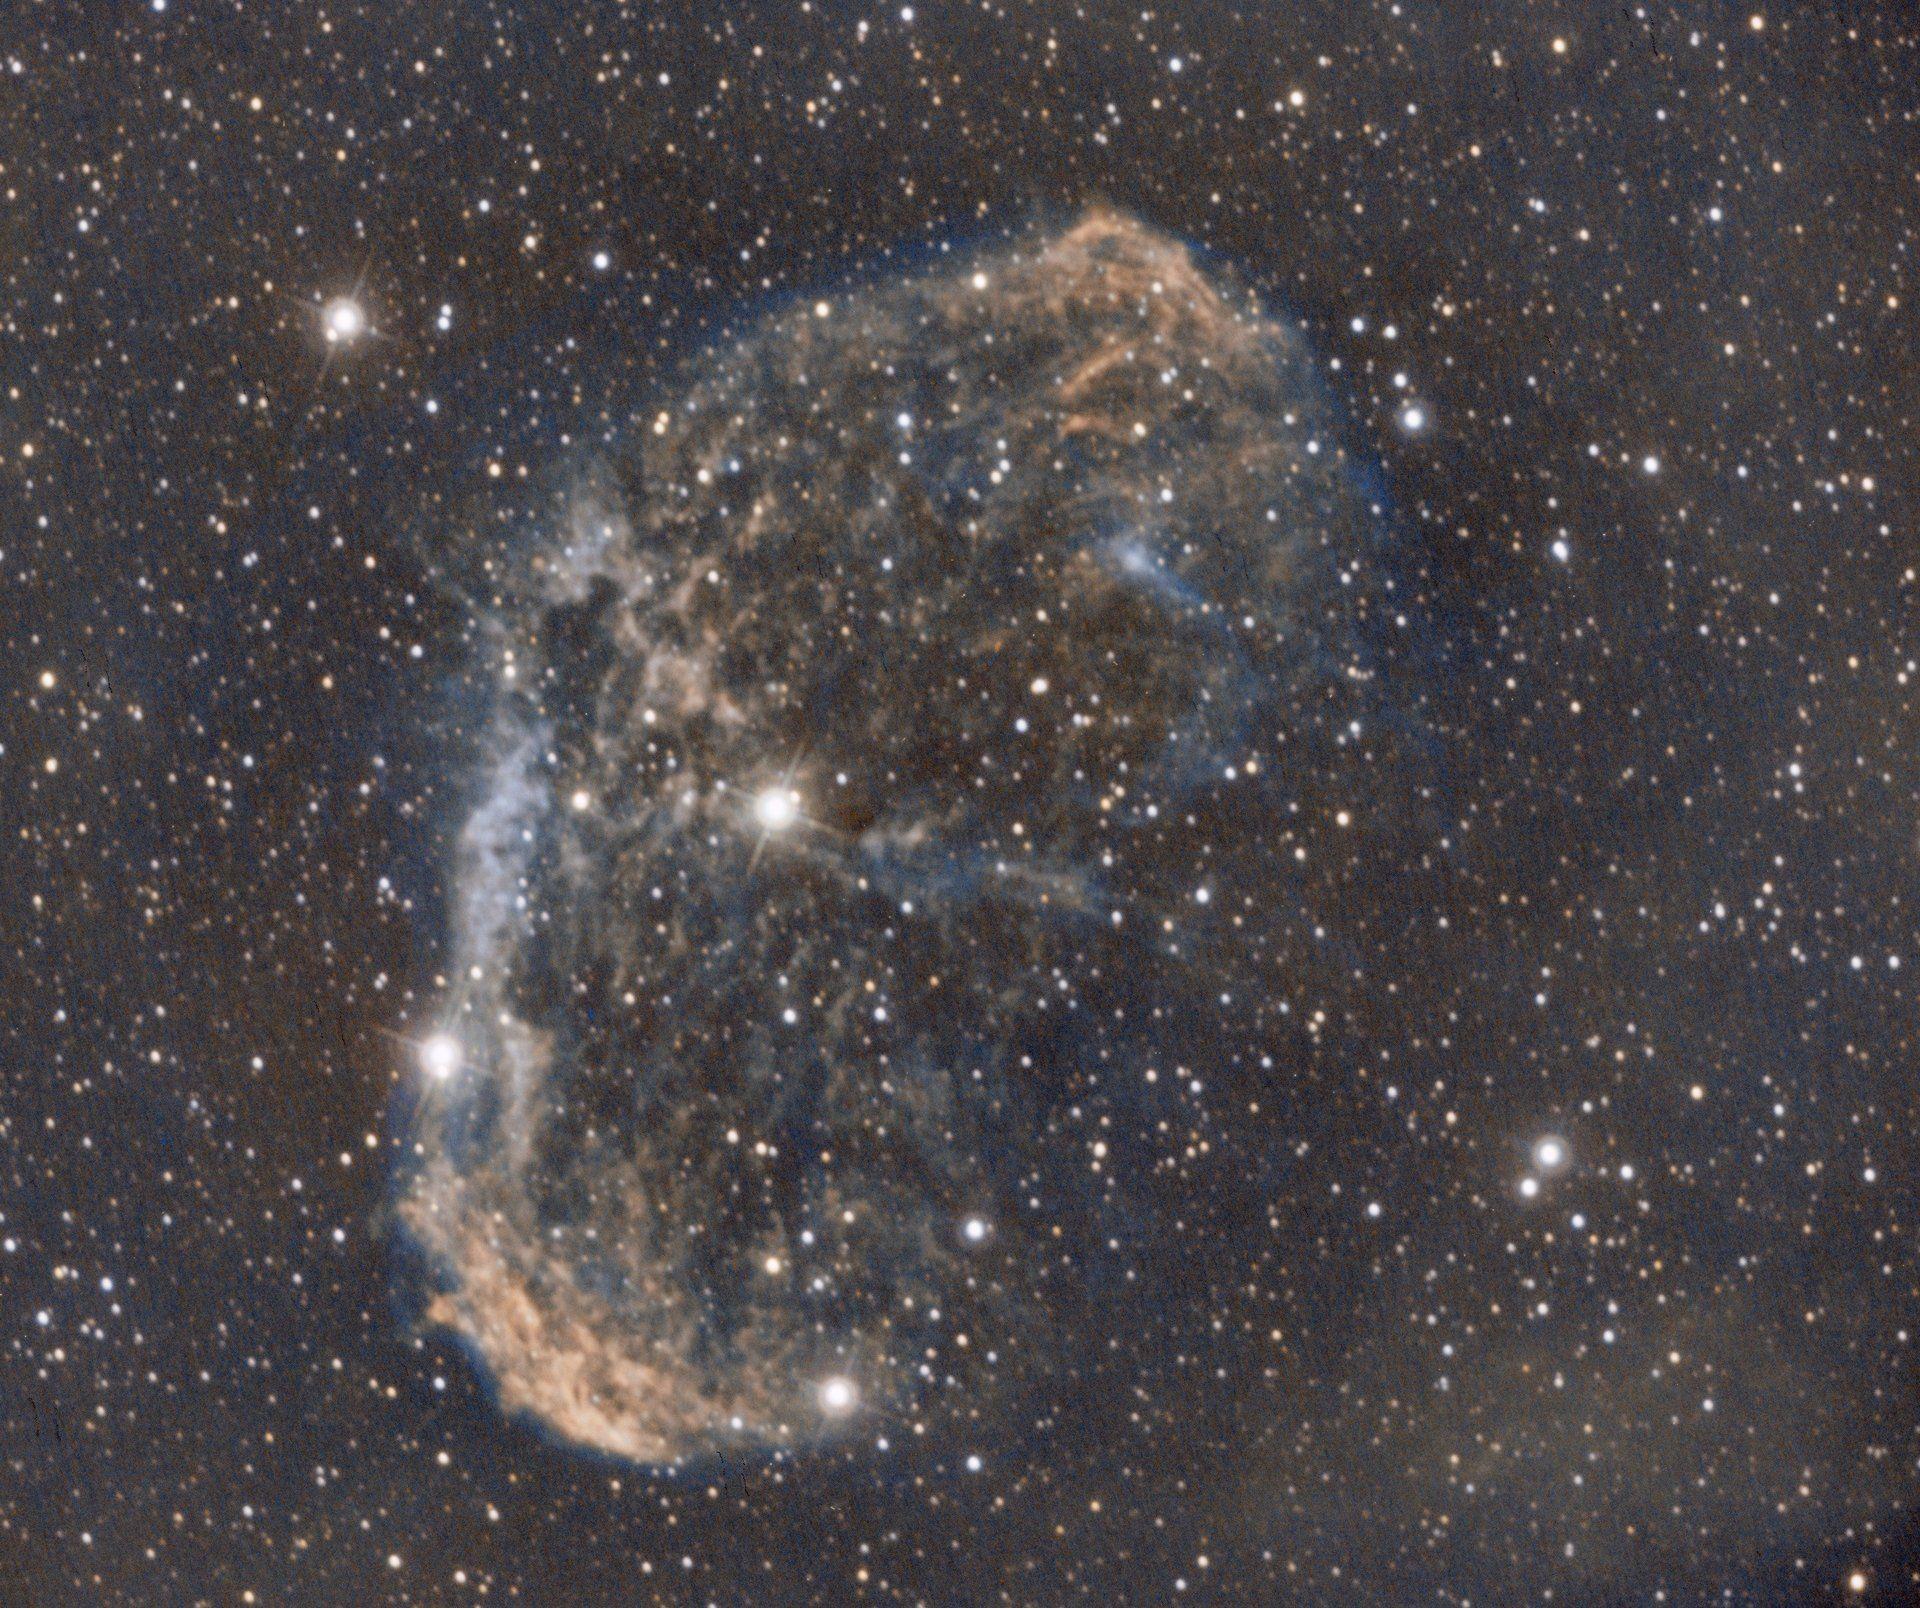 ملف:Carina Nebula around the Wolf-Rayet star WR 22.jpg